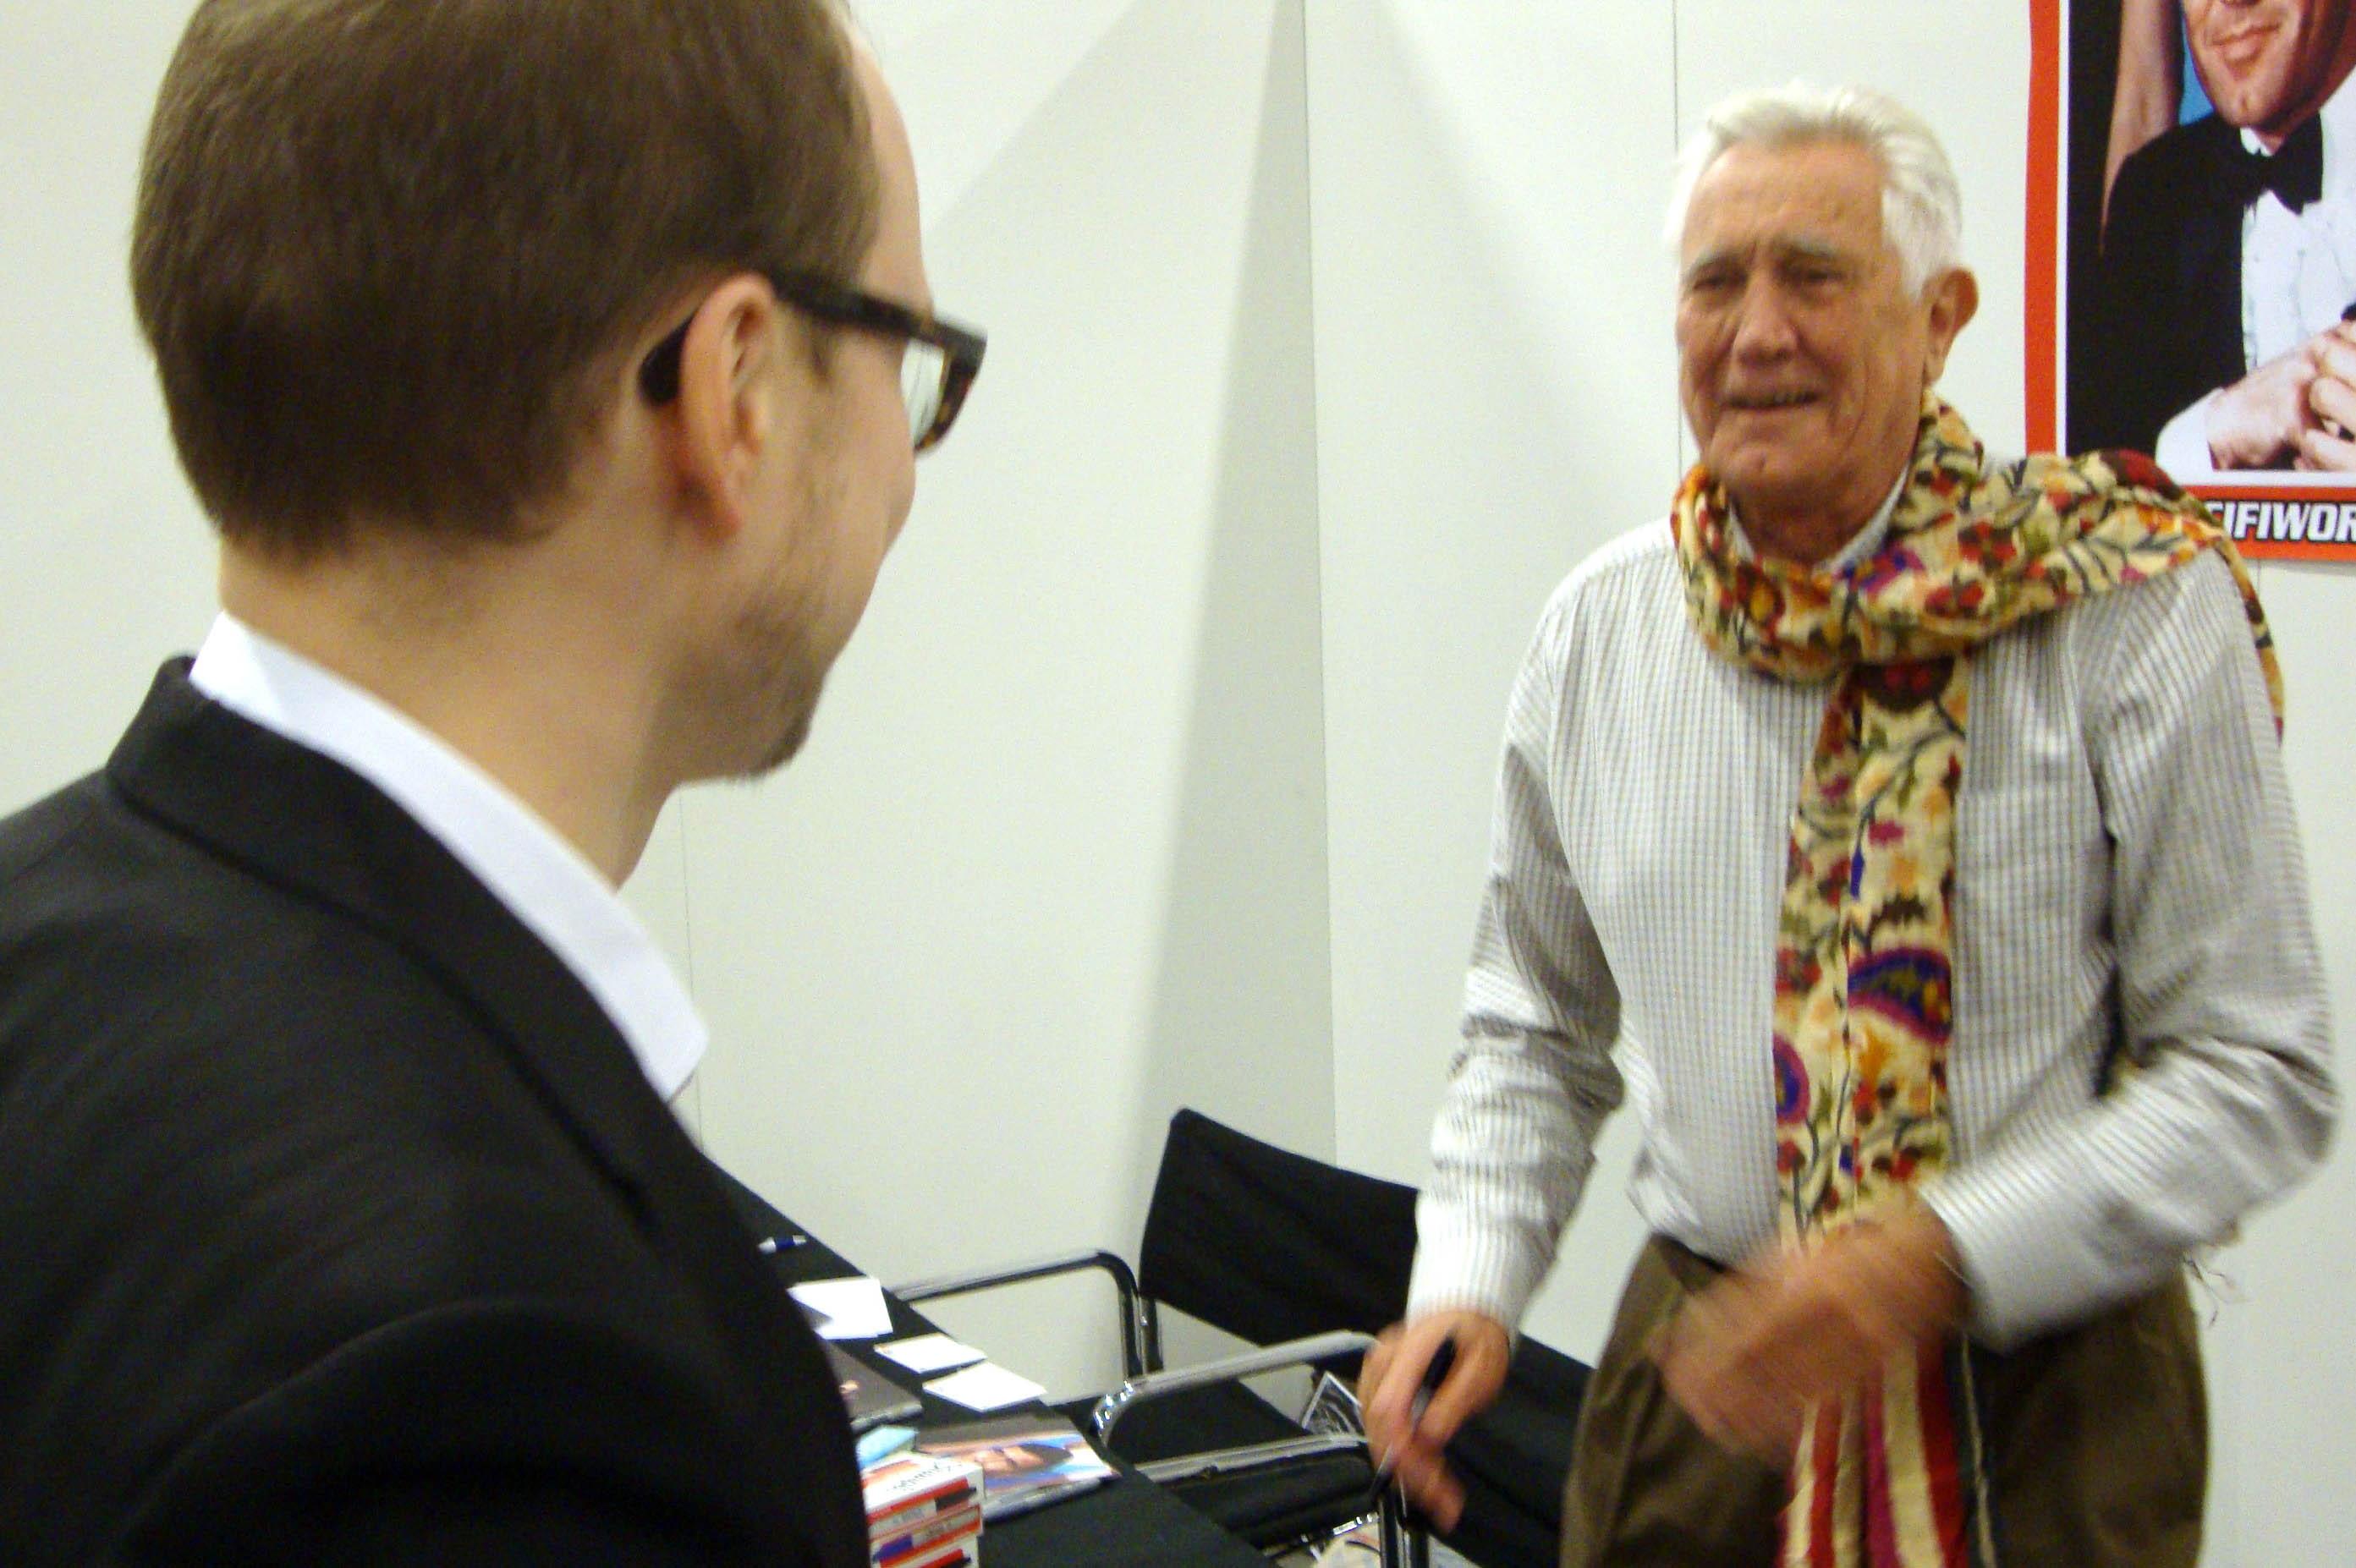 Brie møder George Lazenby på SciFiWorld, Malmö 2014.